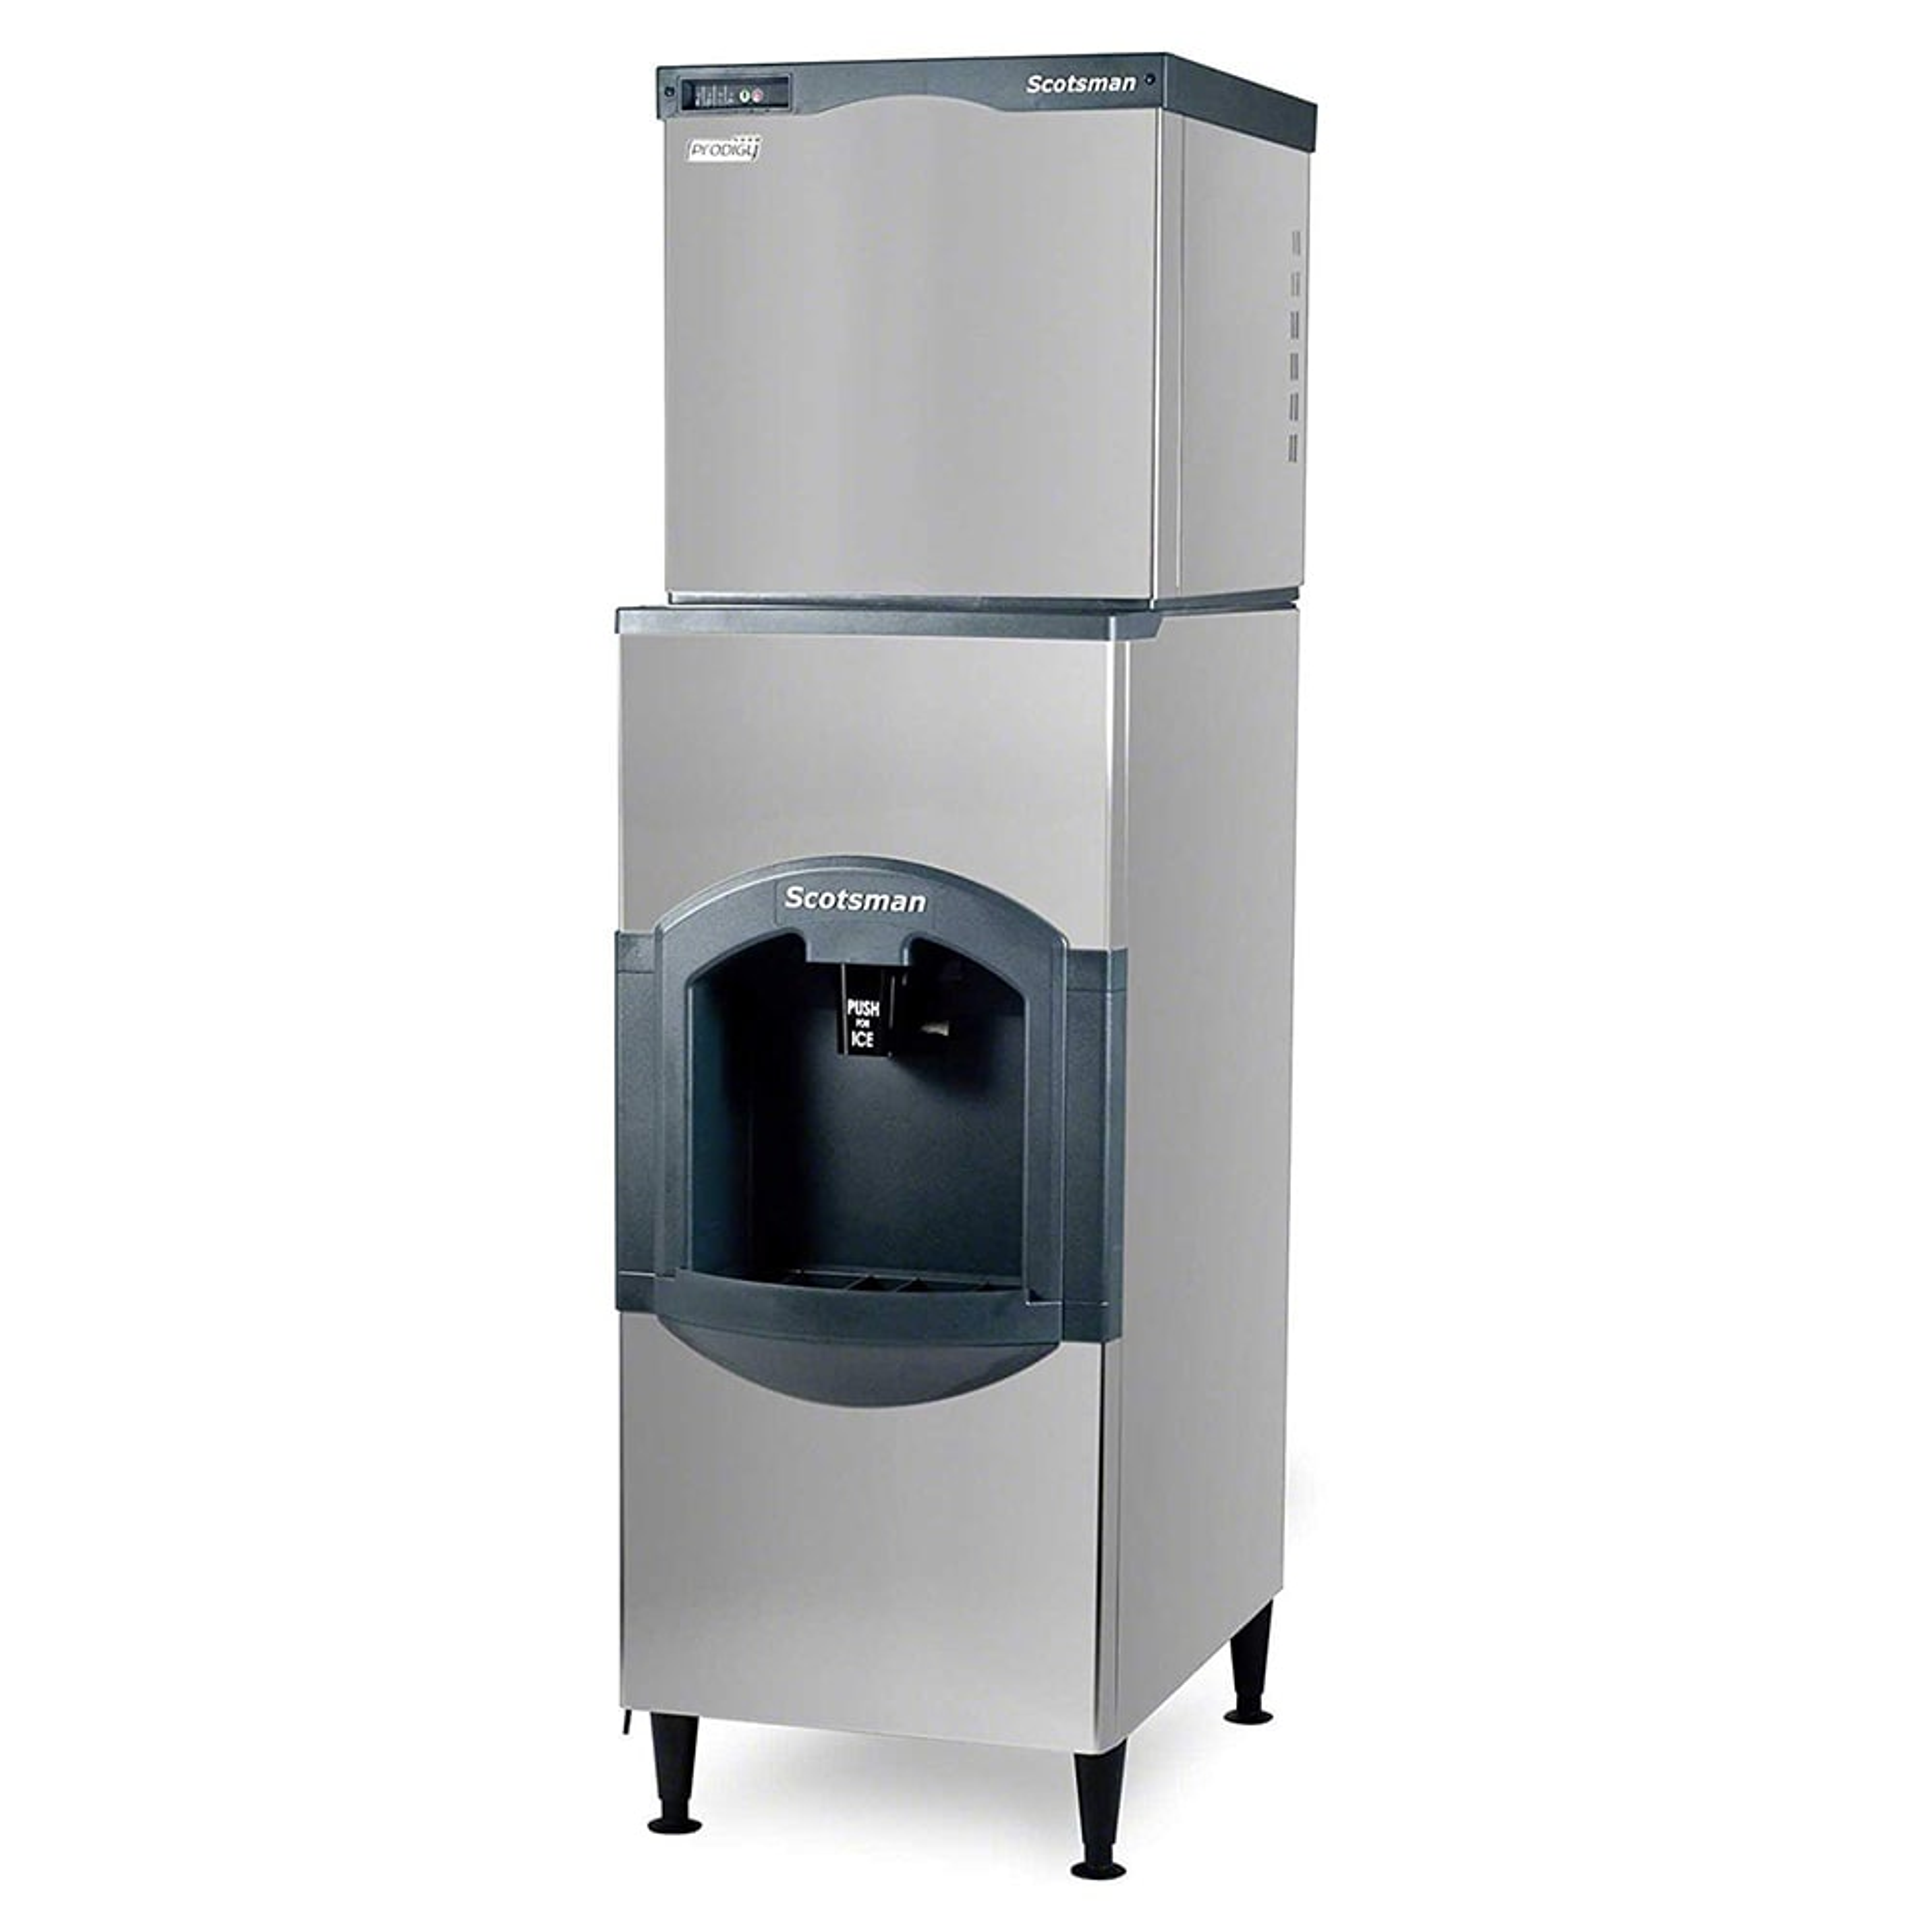 Scotsman C0322MA-1/HD22B-1 356 lb Full Cube Ice Maker w/ Ice Dispenser - 120 lb Storage, Bucket Fill, 115v